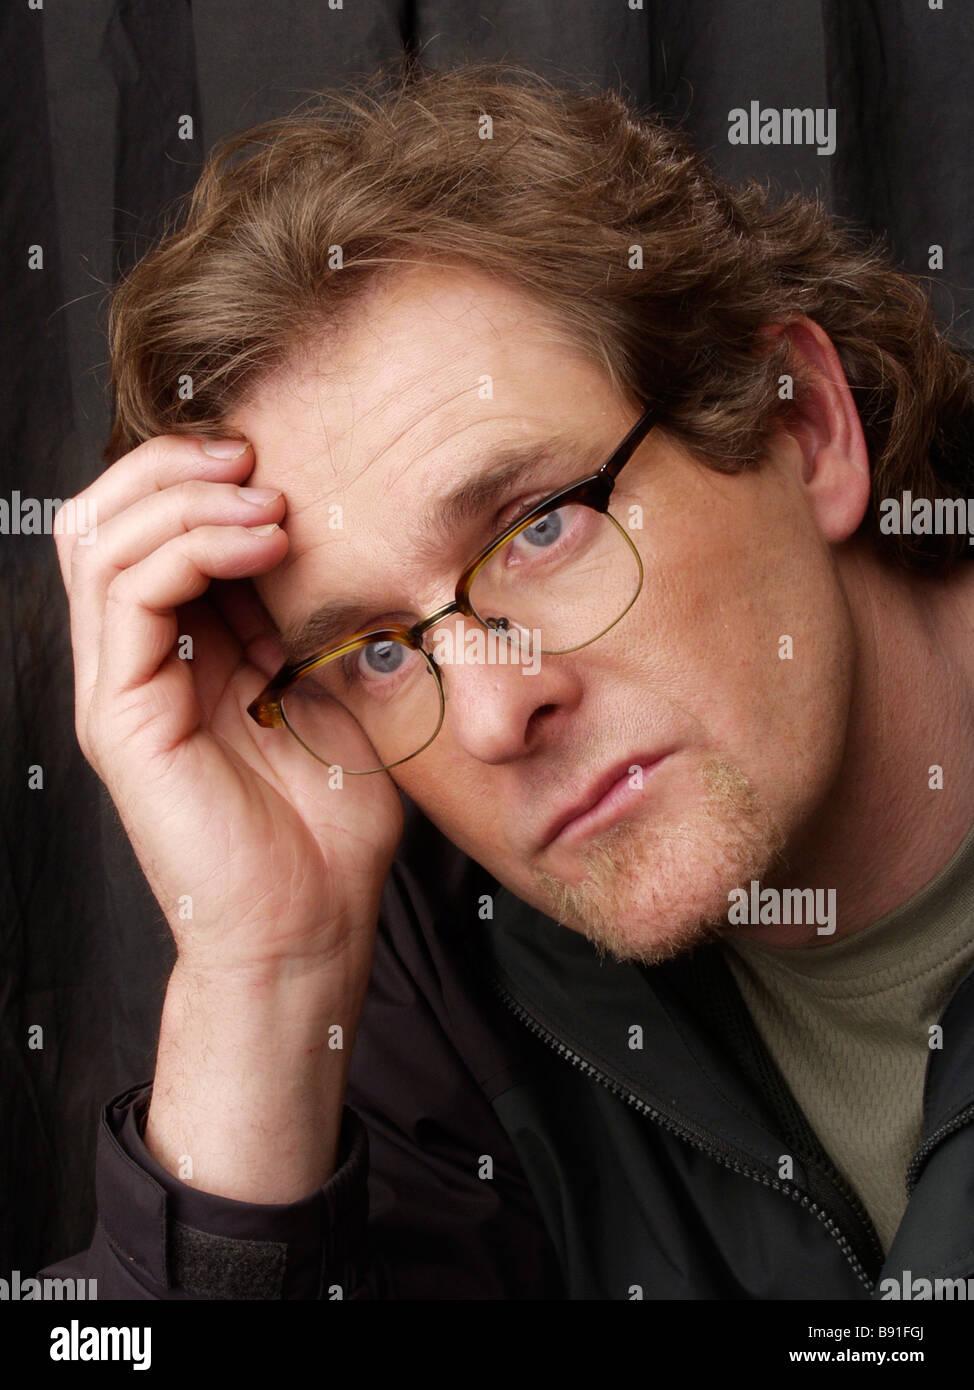 Robert Bathurst actor PER0149 - Stock Image